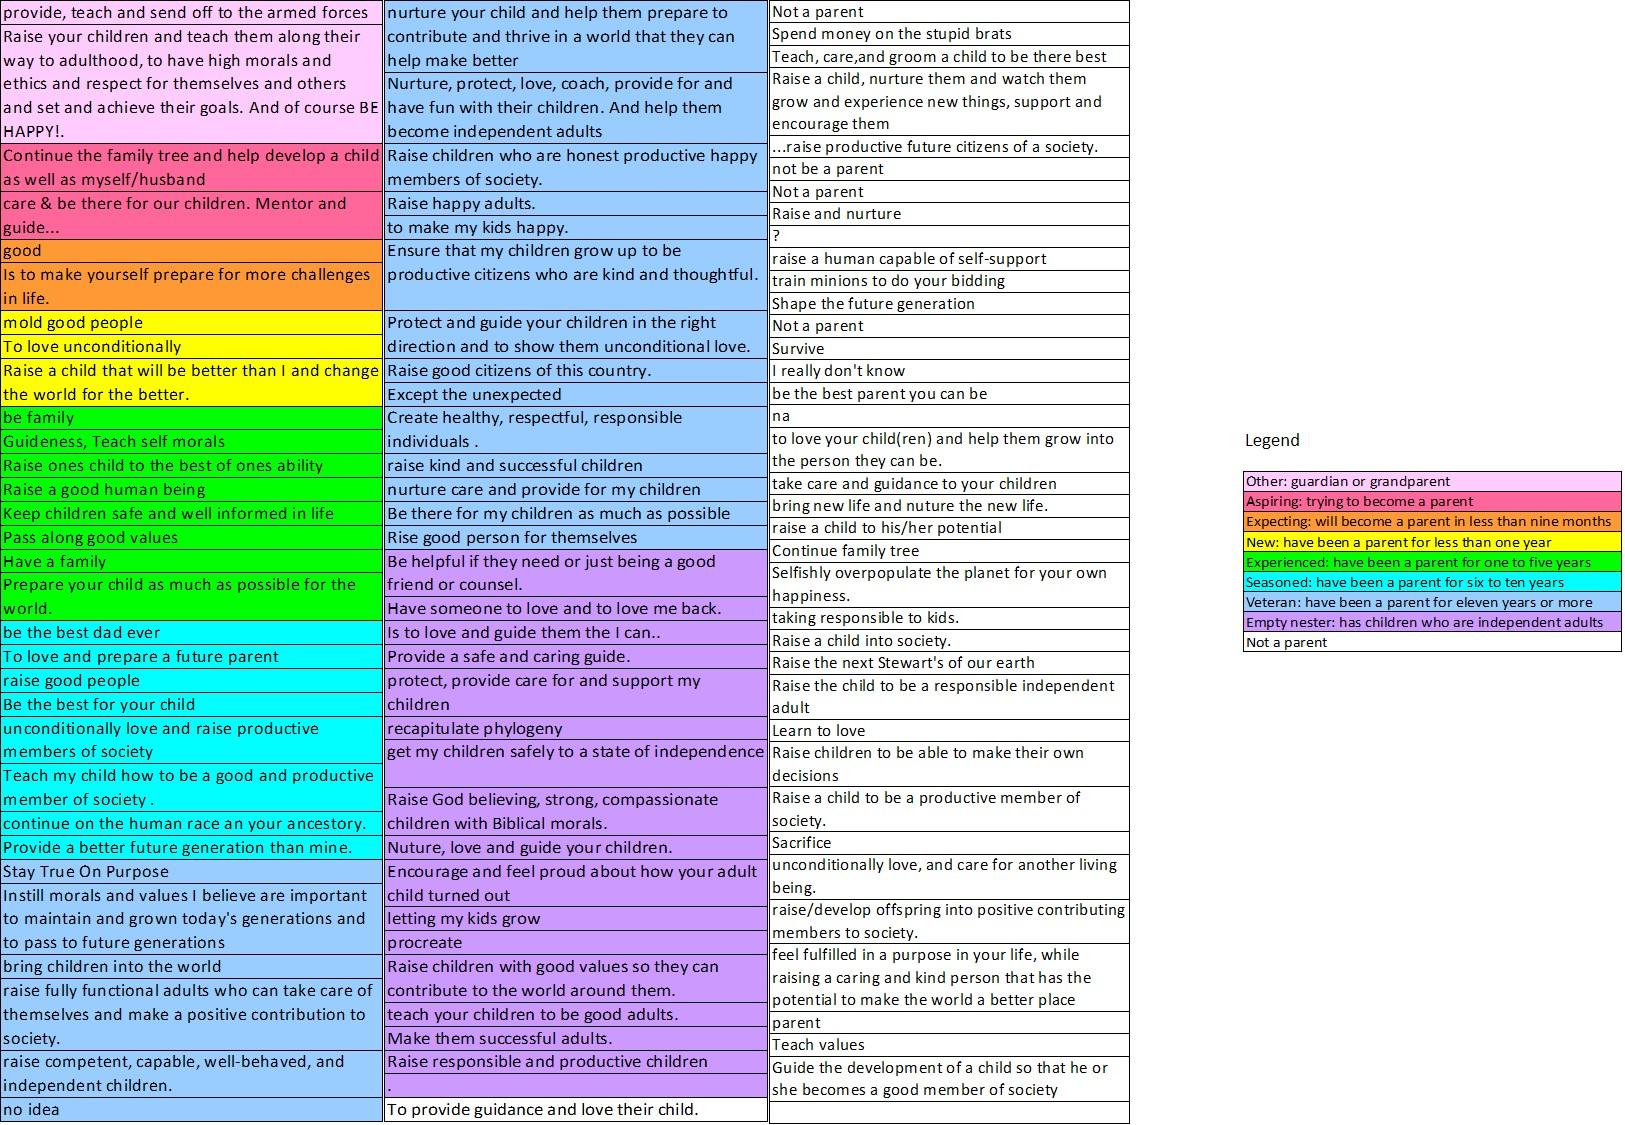 Figure 2. One Hundred Survey Responses Revealing Parenting Purposes